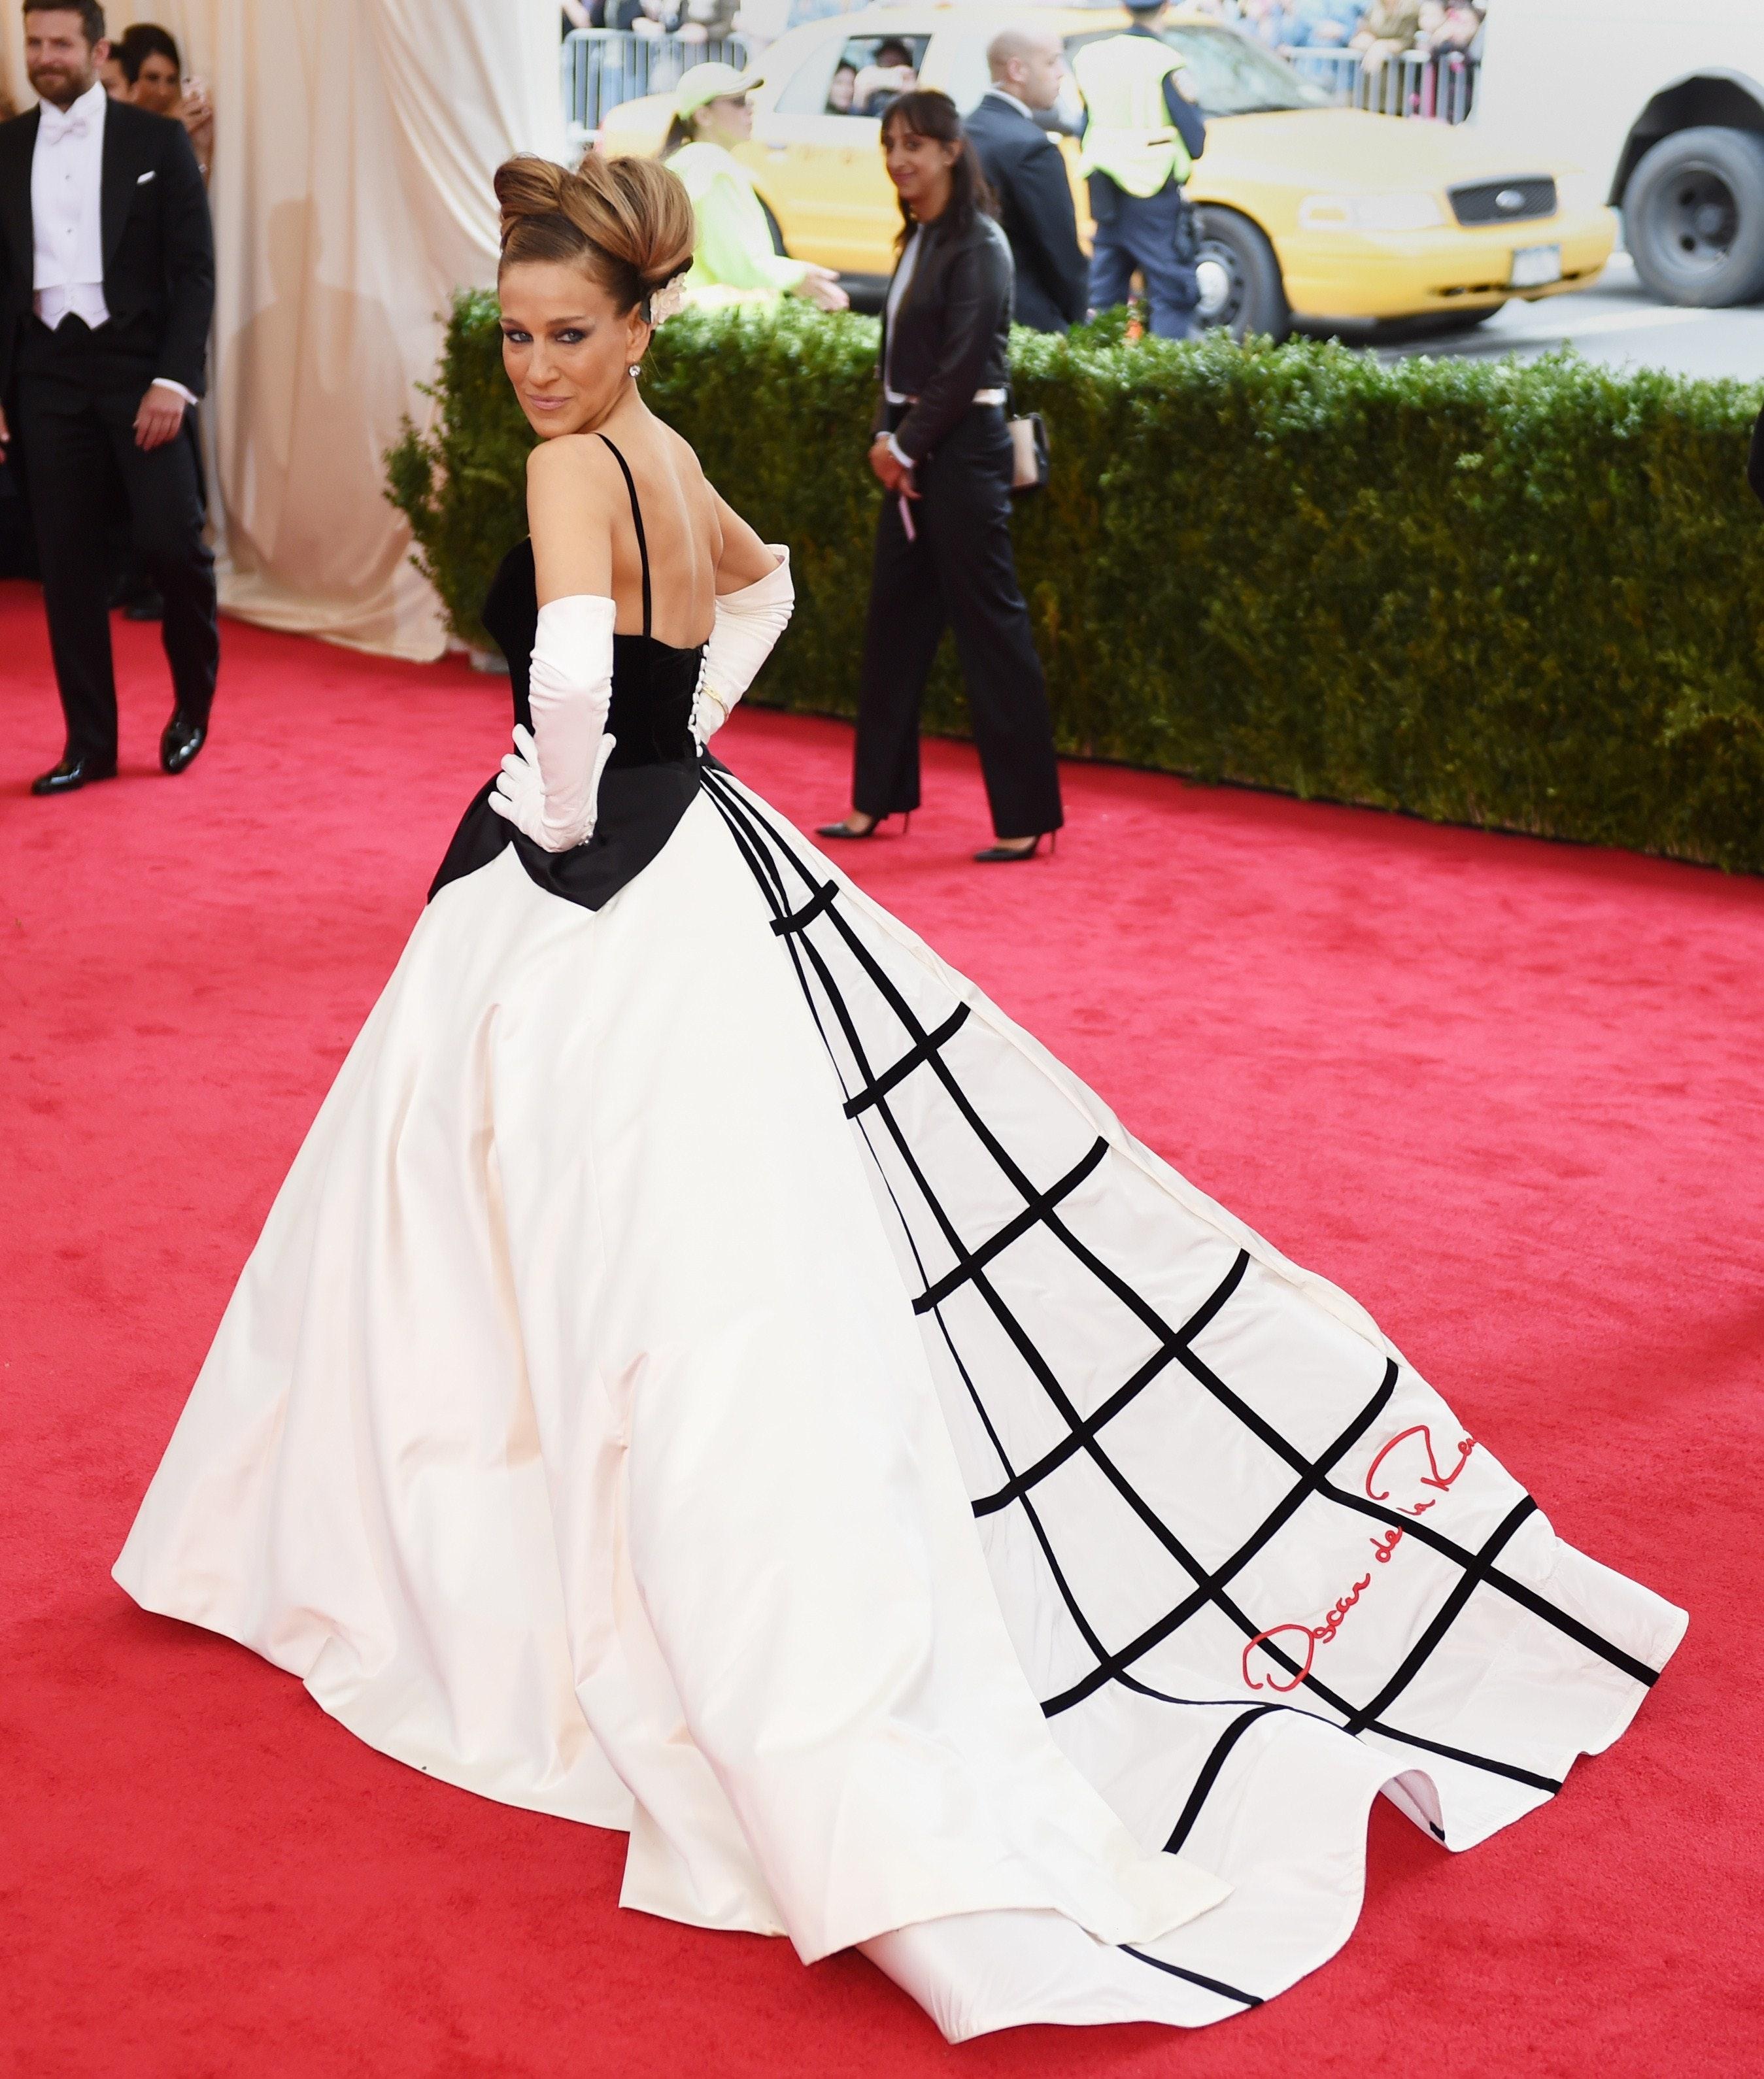 Jessica white red carpet dress